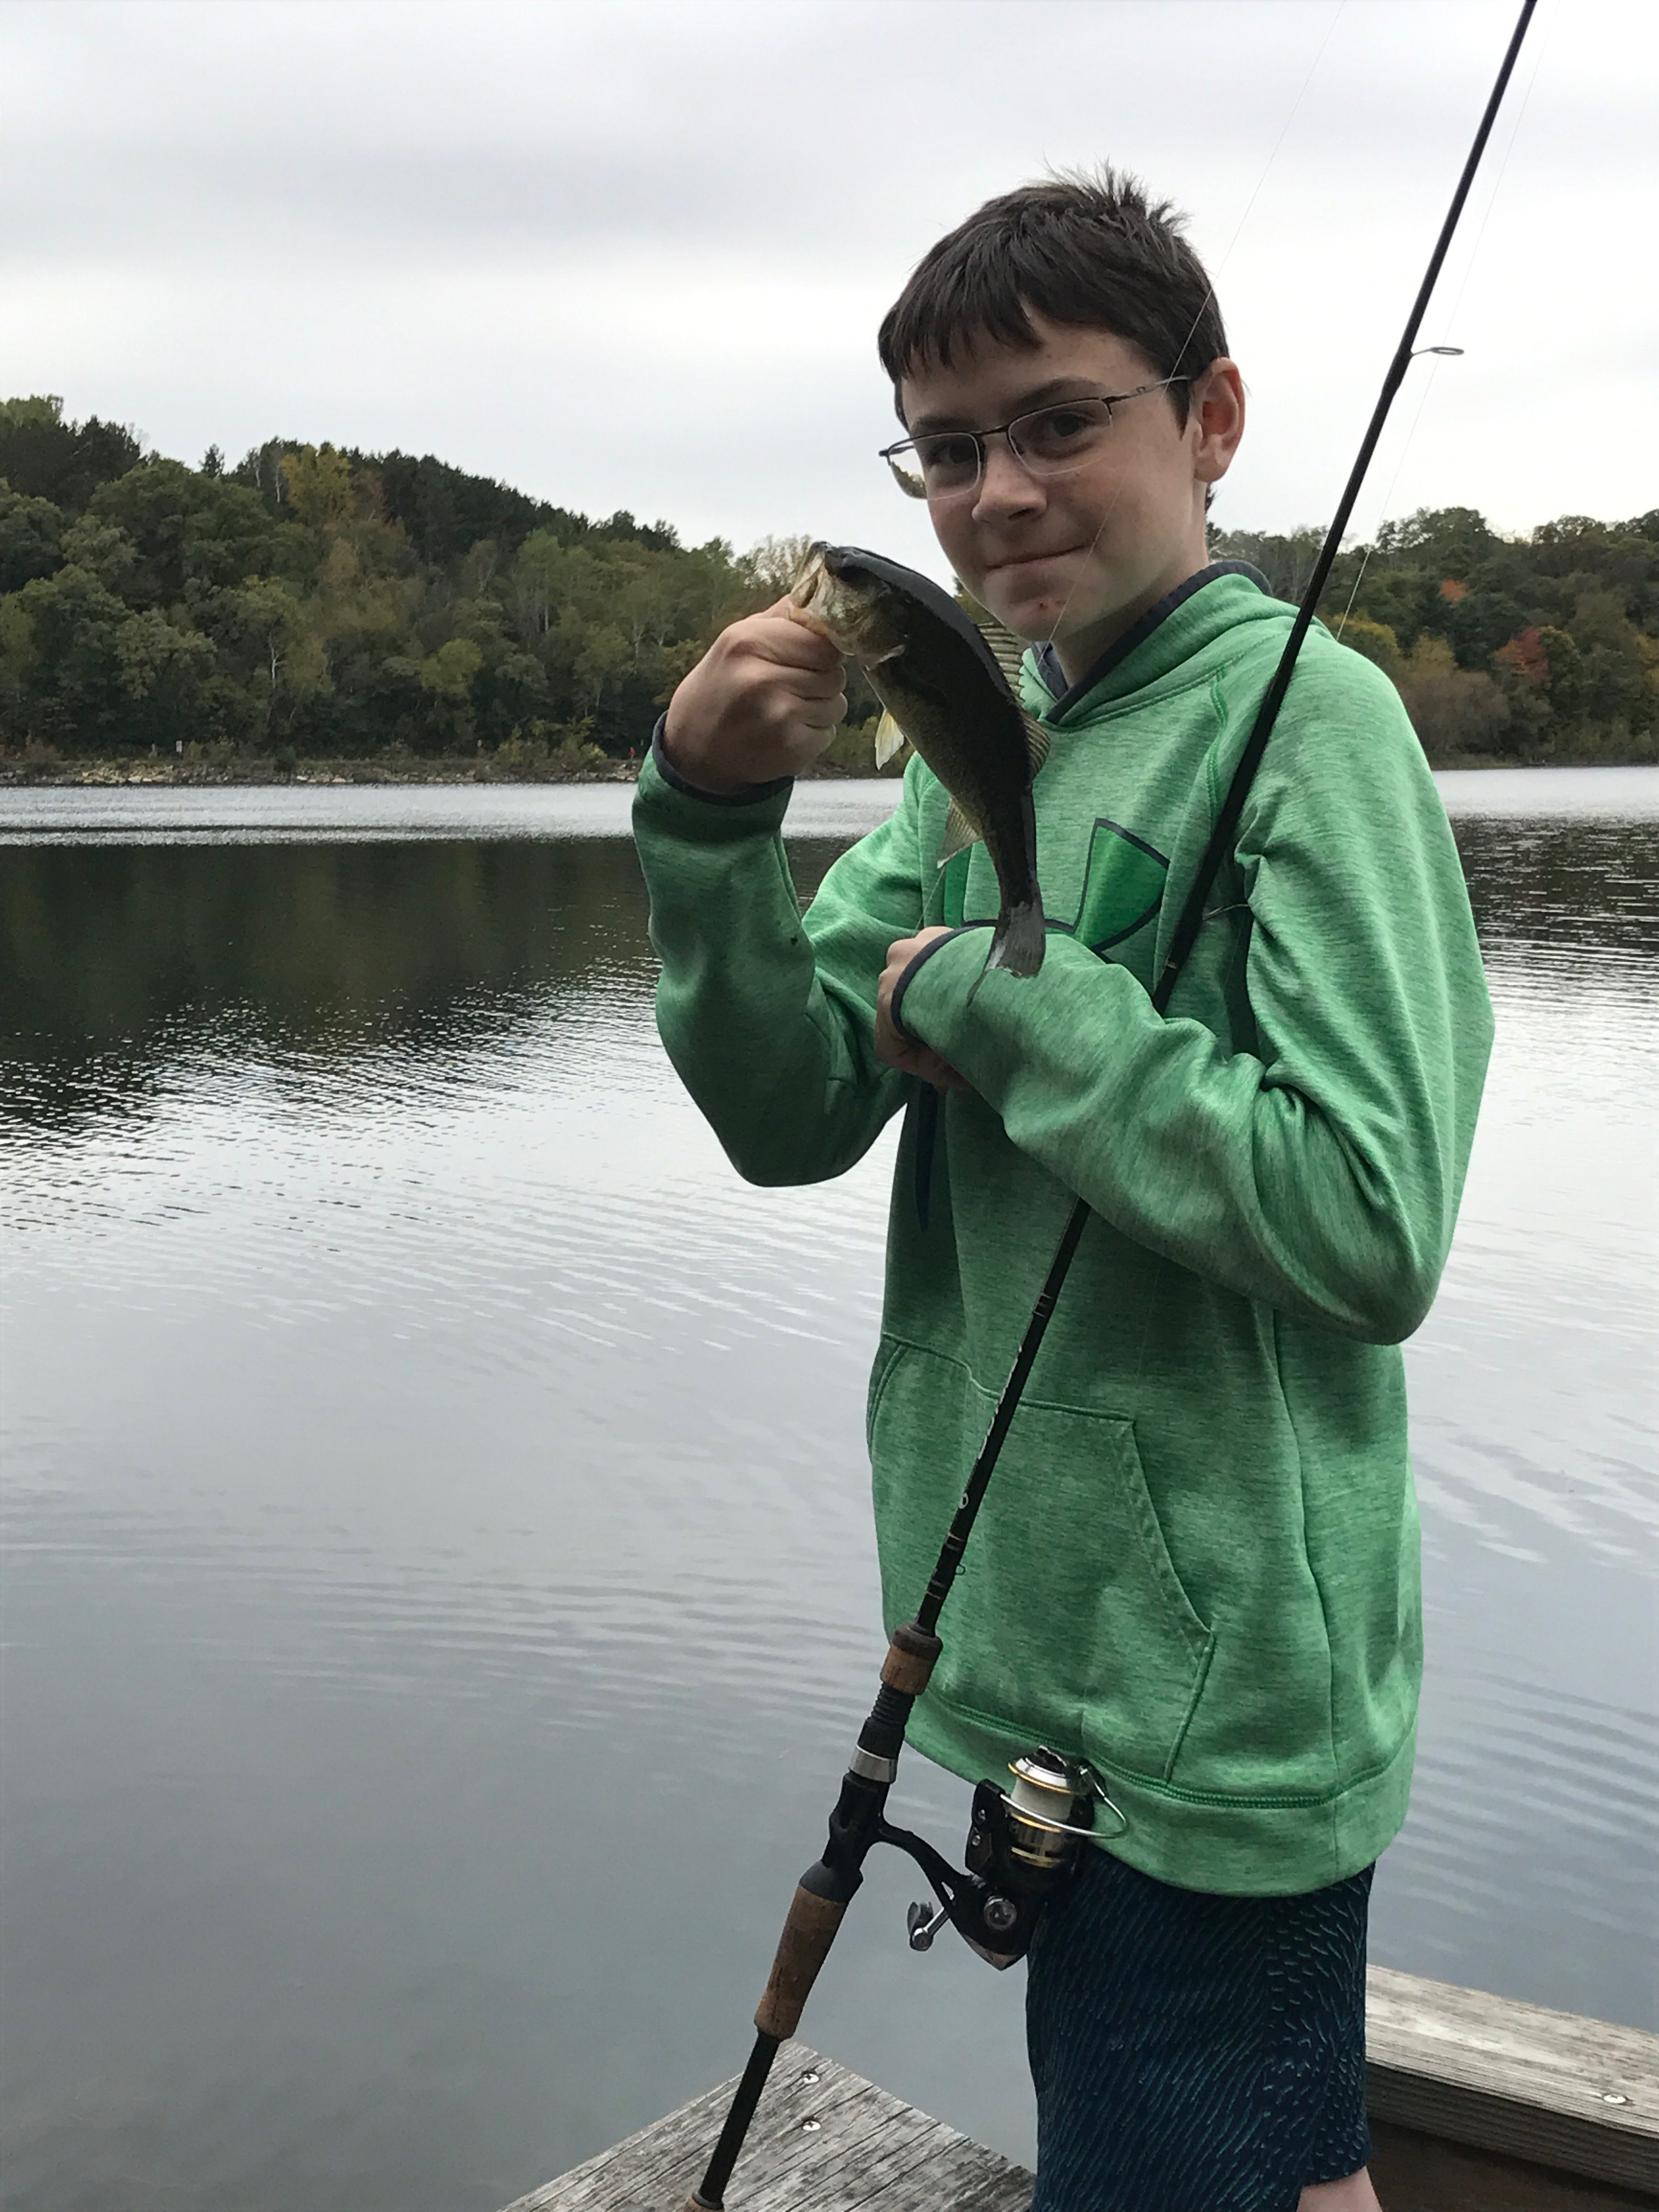 Fishing Club - Hudson Schools